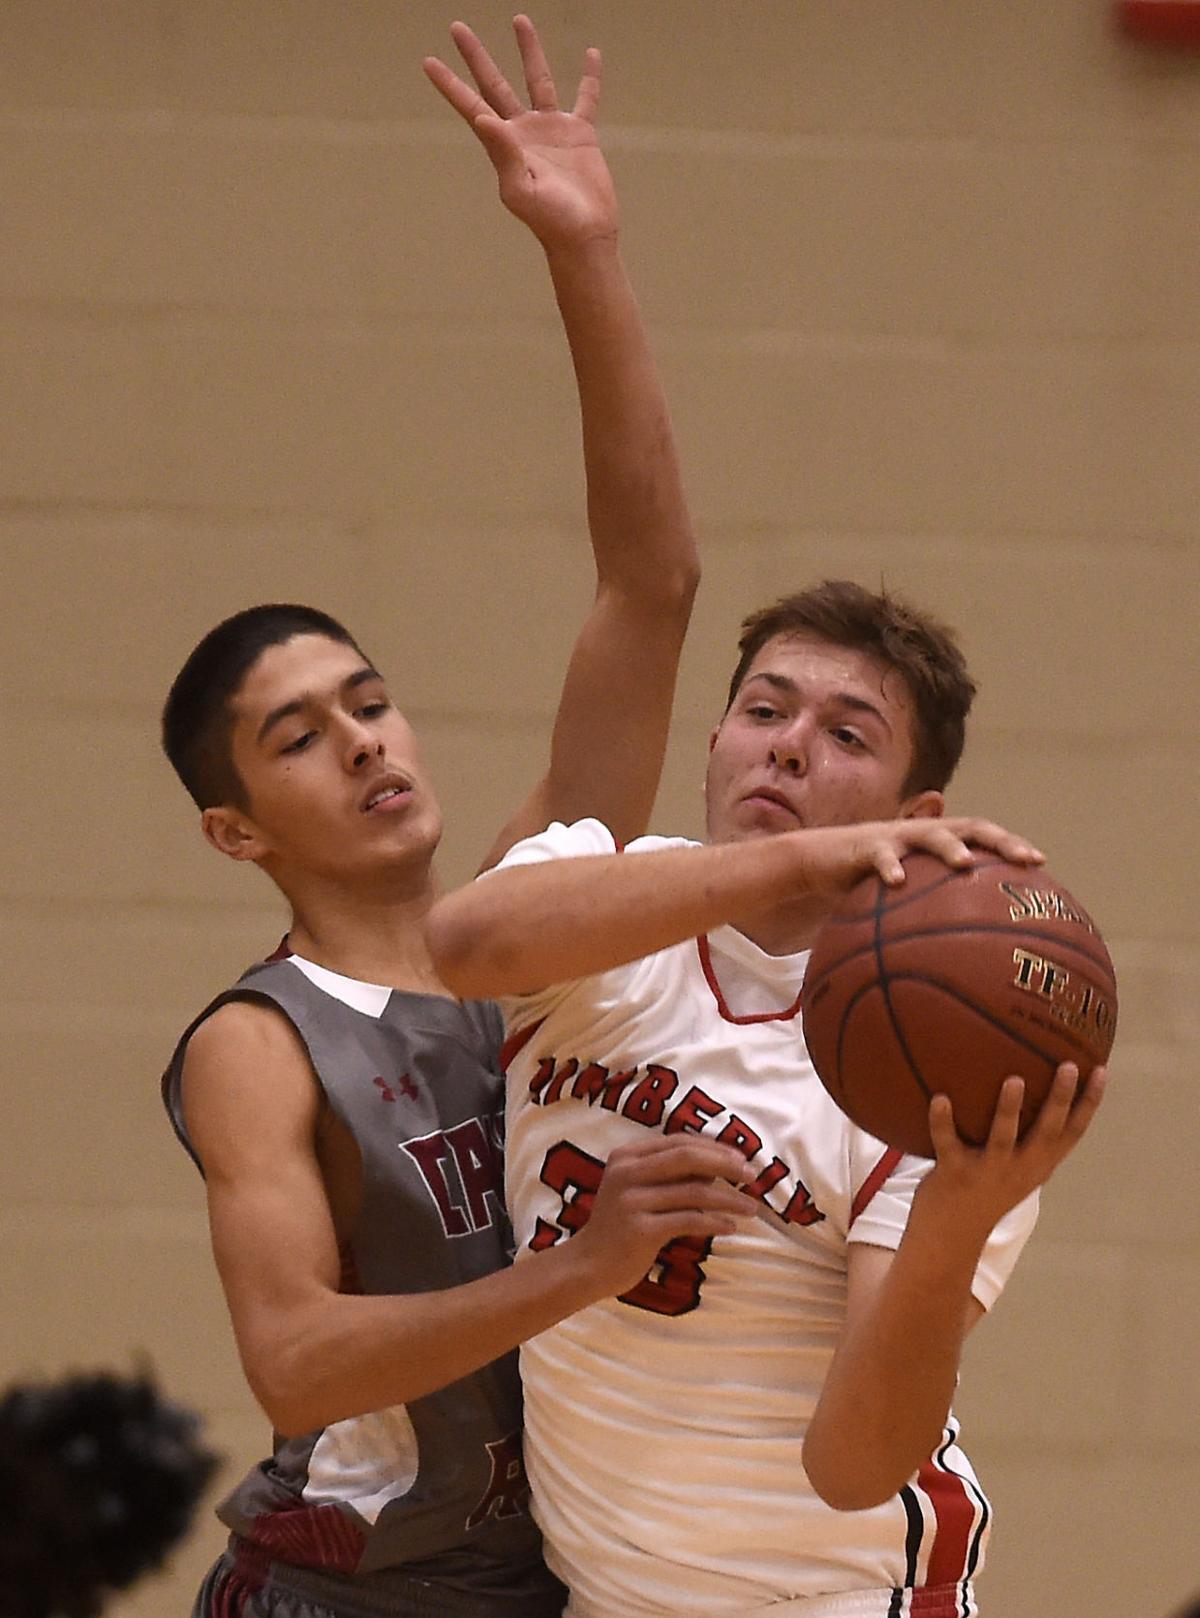 Boys Basketball - Canyon Ridge Vs. Kimberly